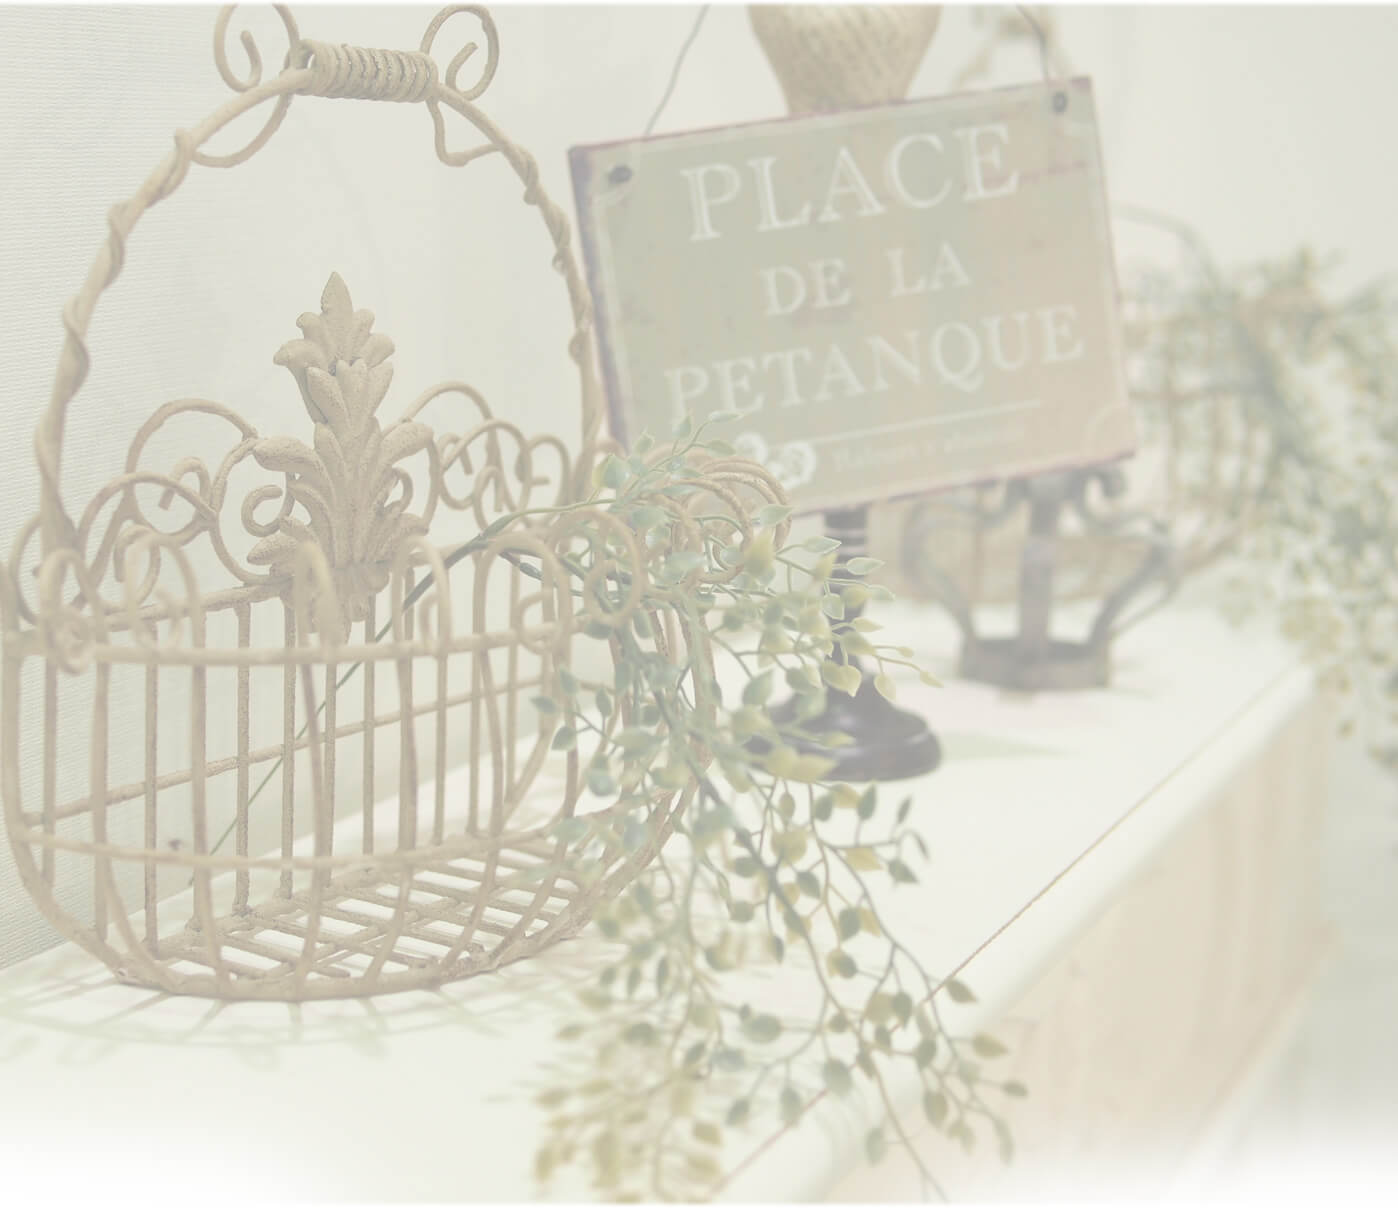 7bf62106ff159 ブライダルハウス島田 - 結婚式や披露宴でのドレス選び、アクセサリーや ...